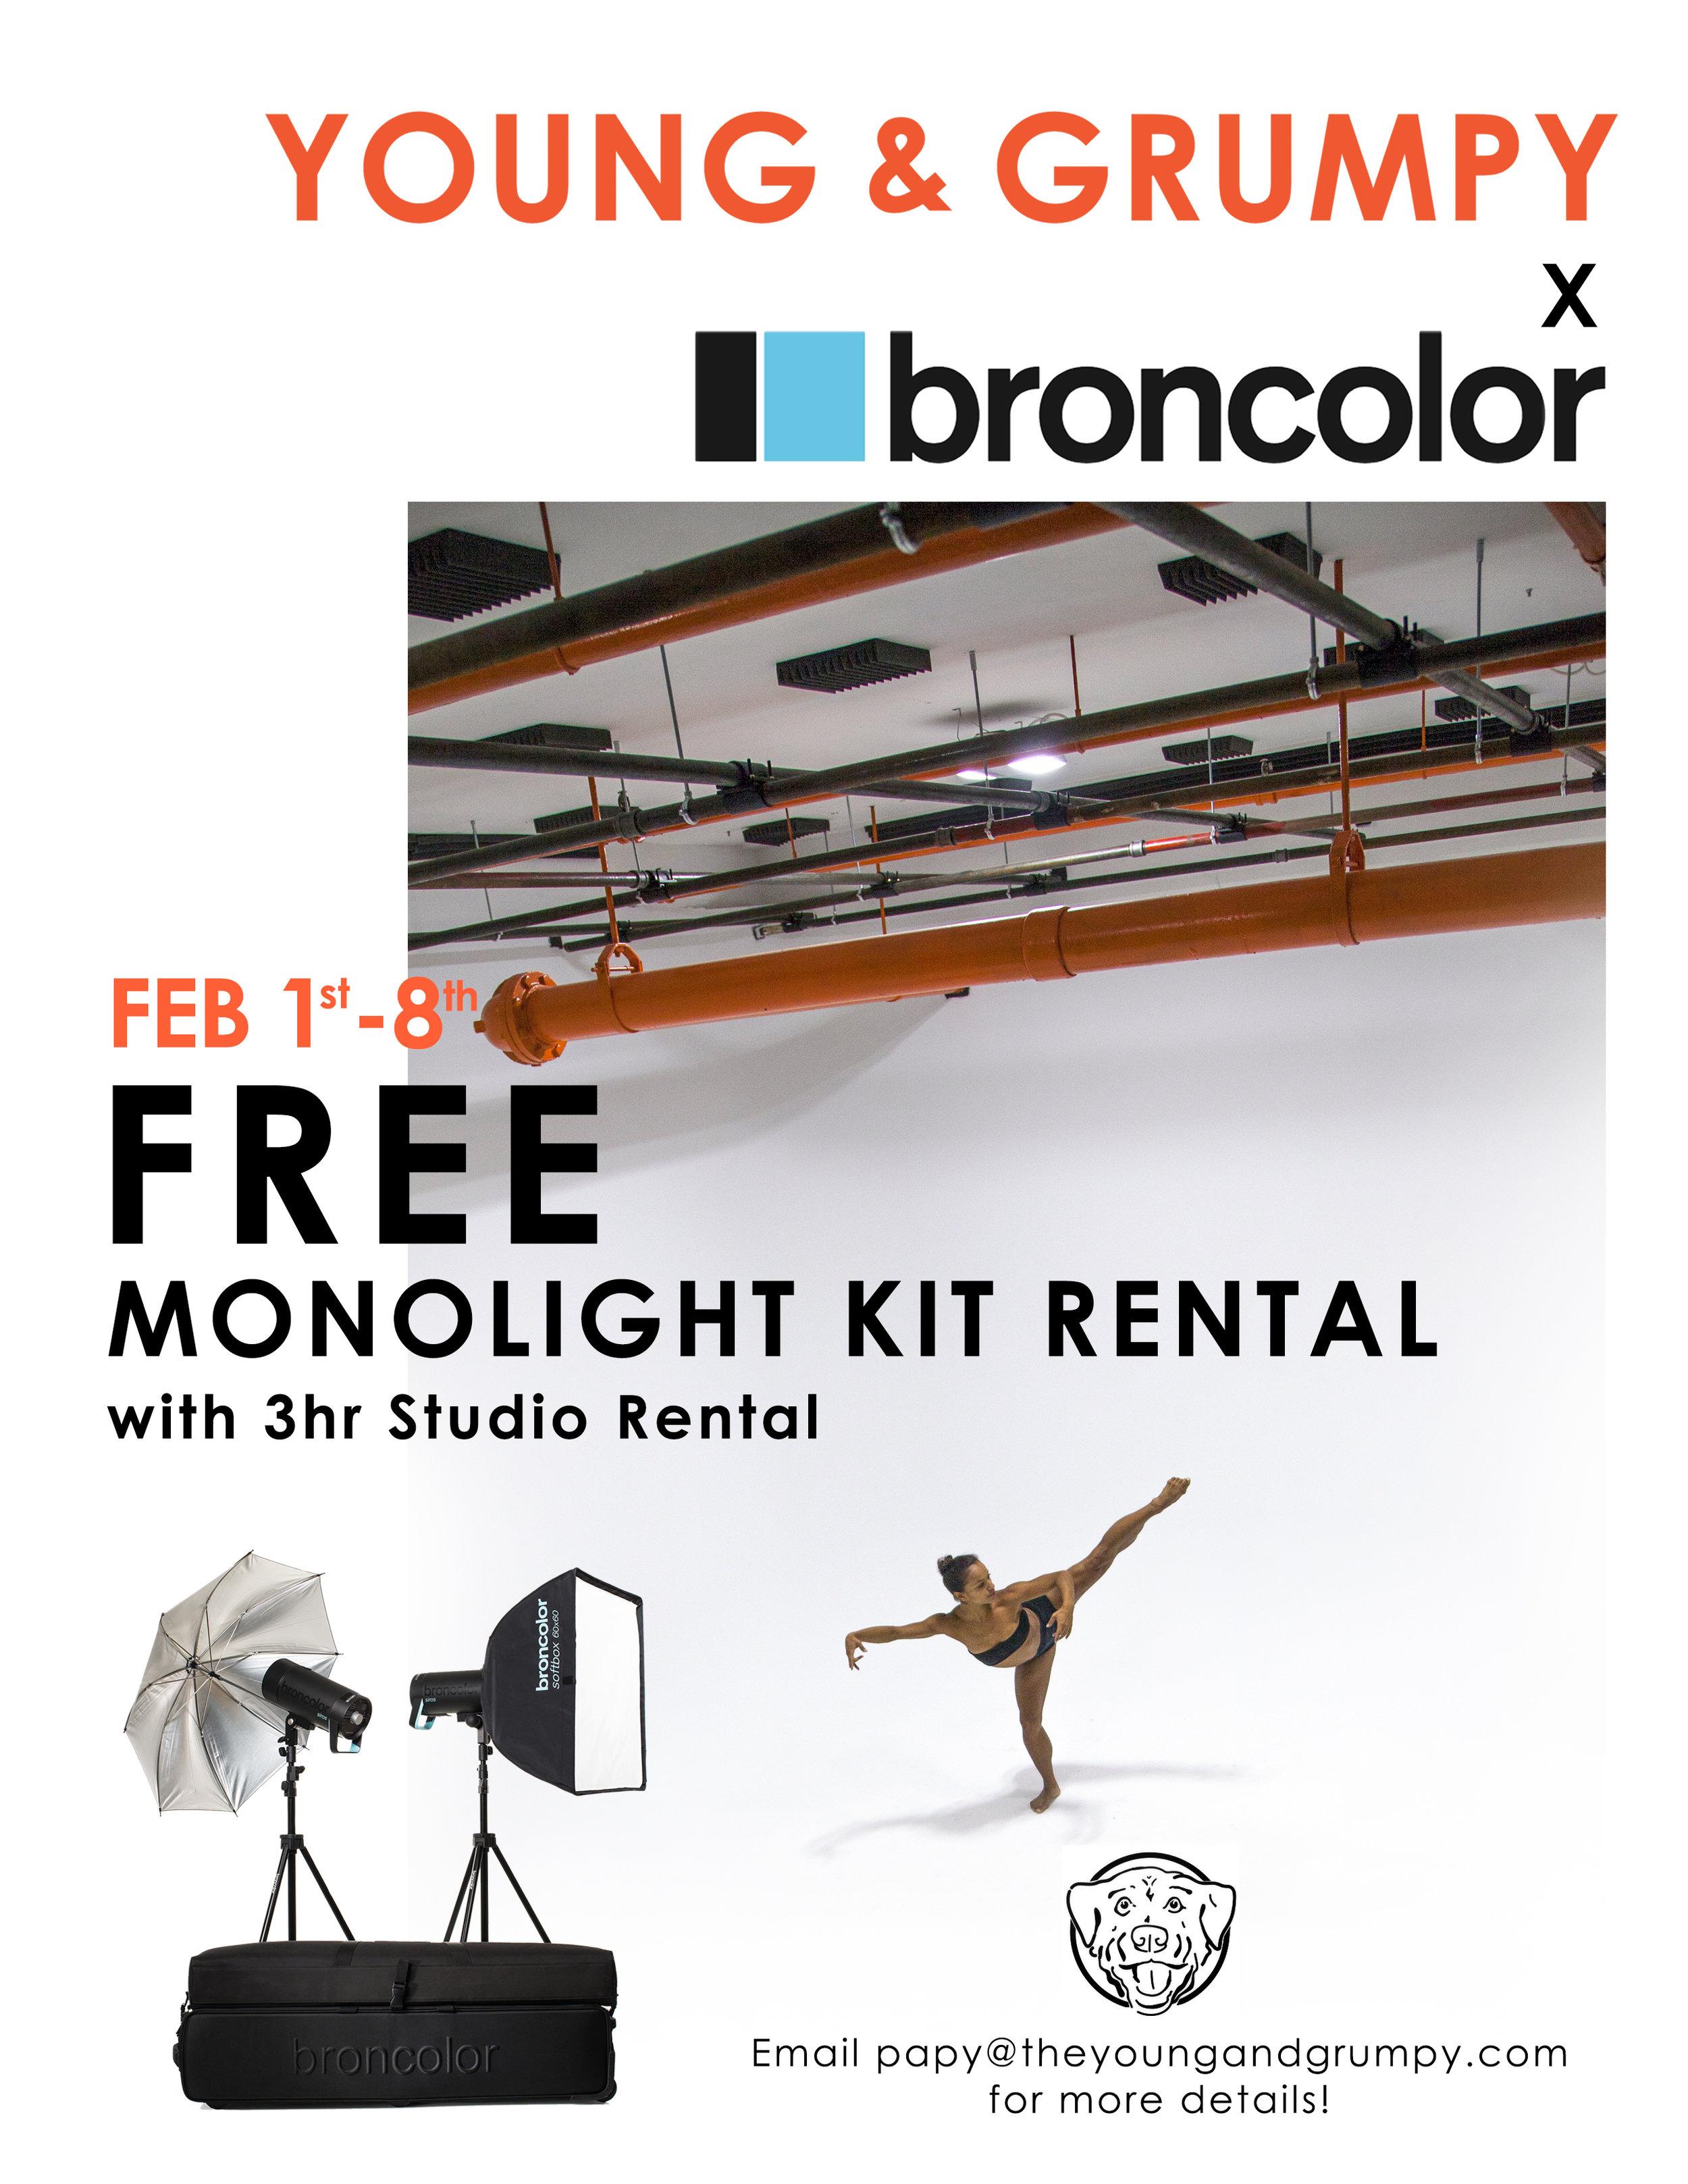 BroncolorPromo.jpg